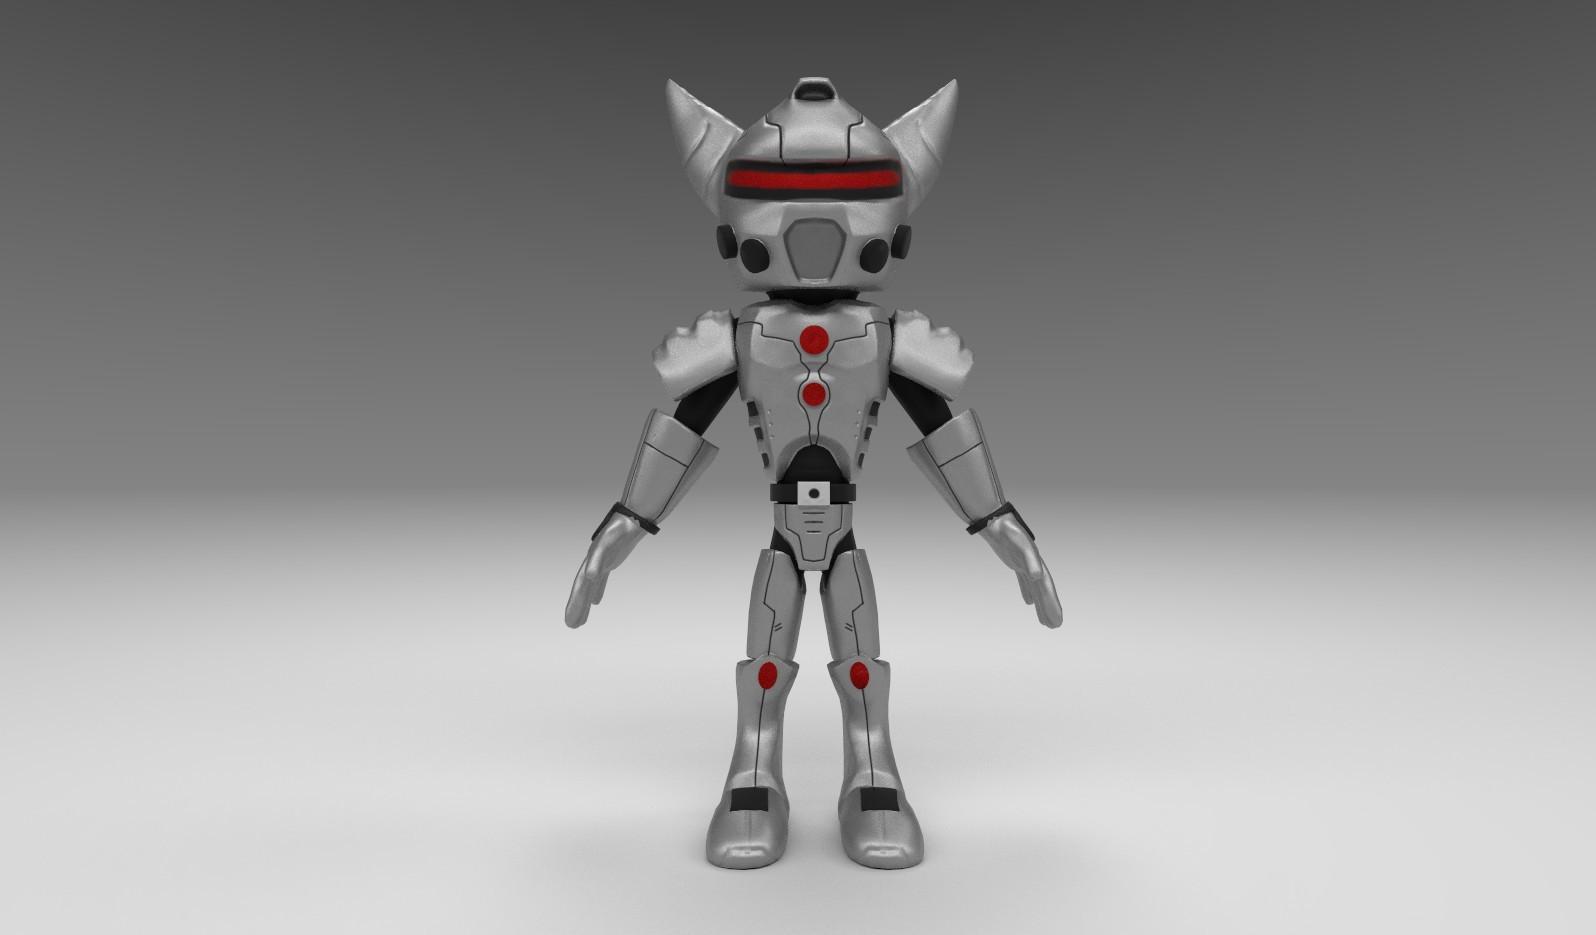 ArtStation - Ratchet 3D Model, David